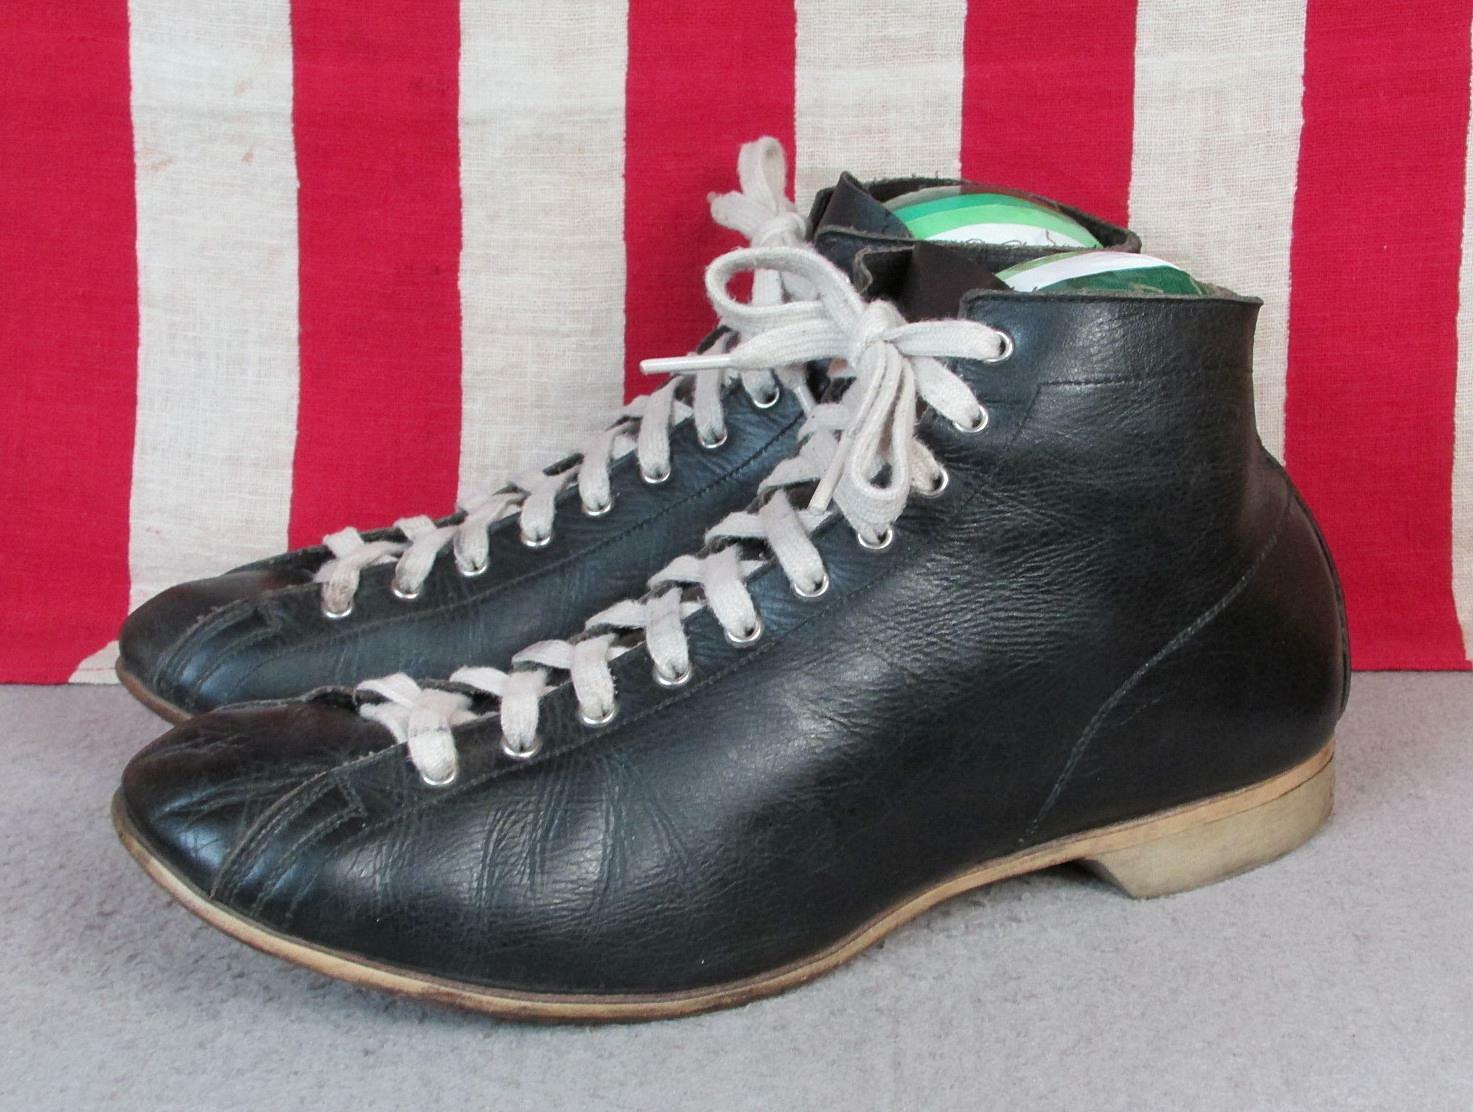 Vintage 1930s Black Leather High Top Athletic Sho… - image 5